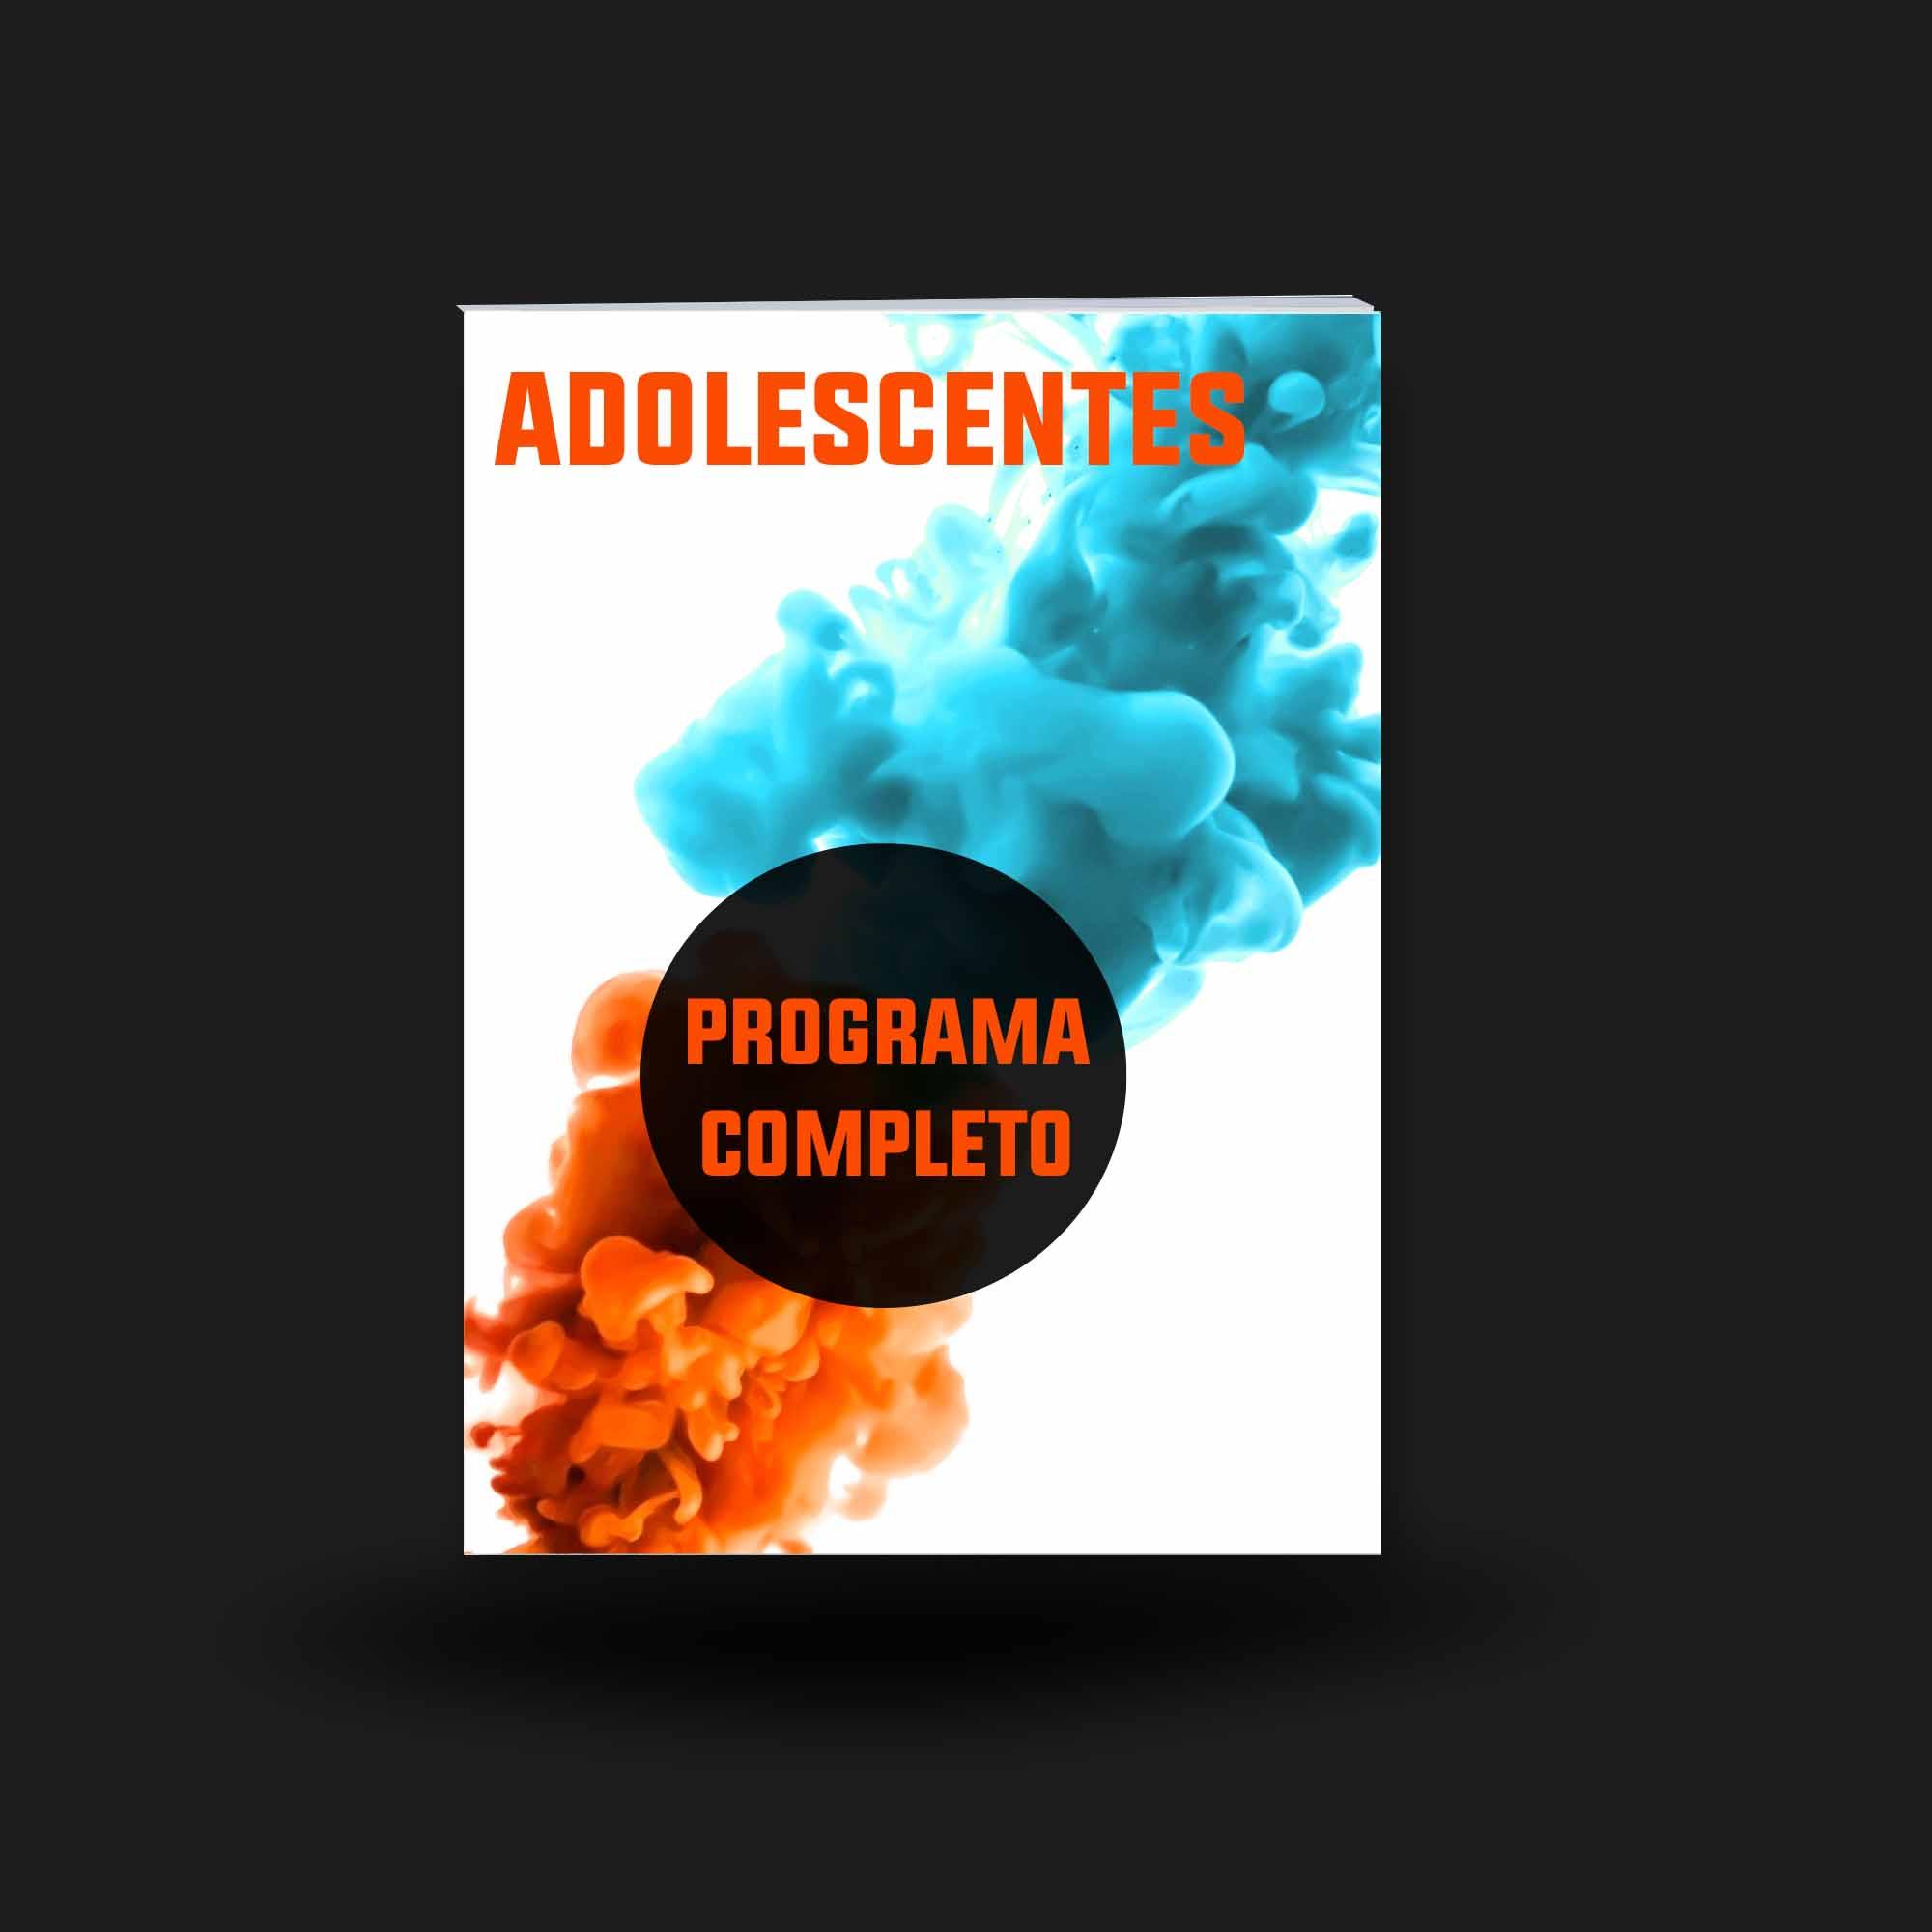 Adolescentes Programa Completo